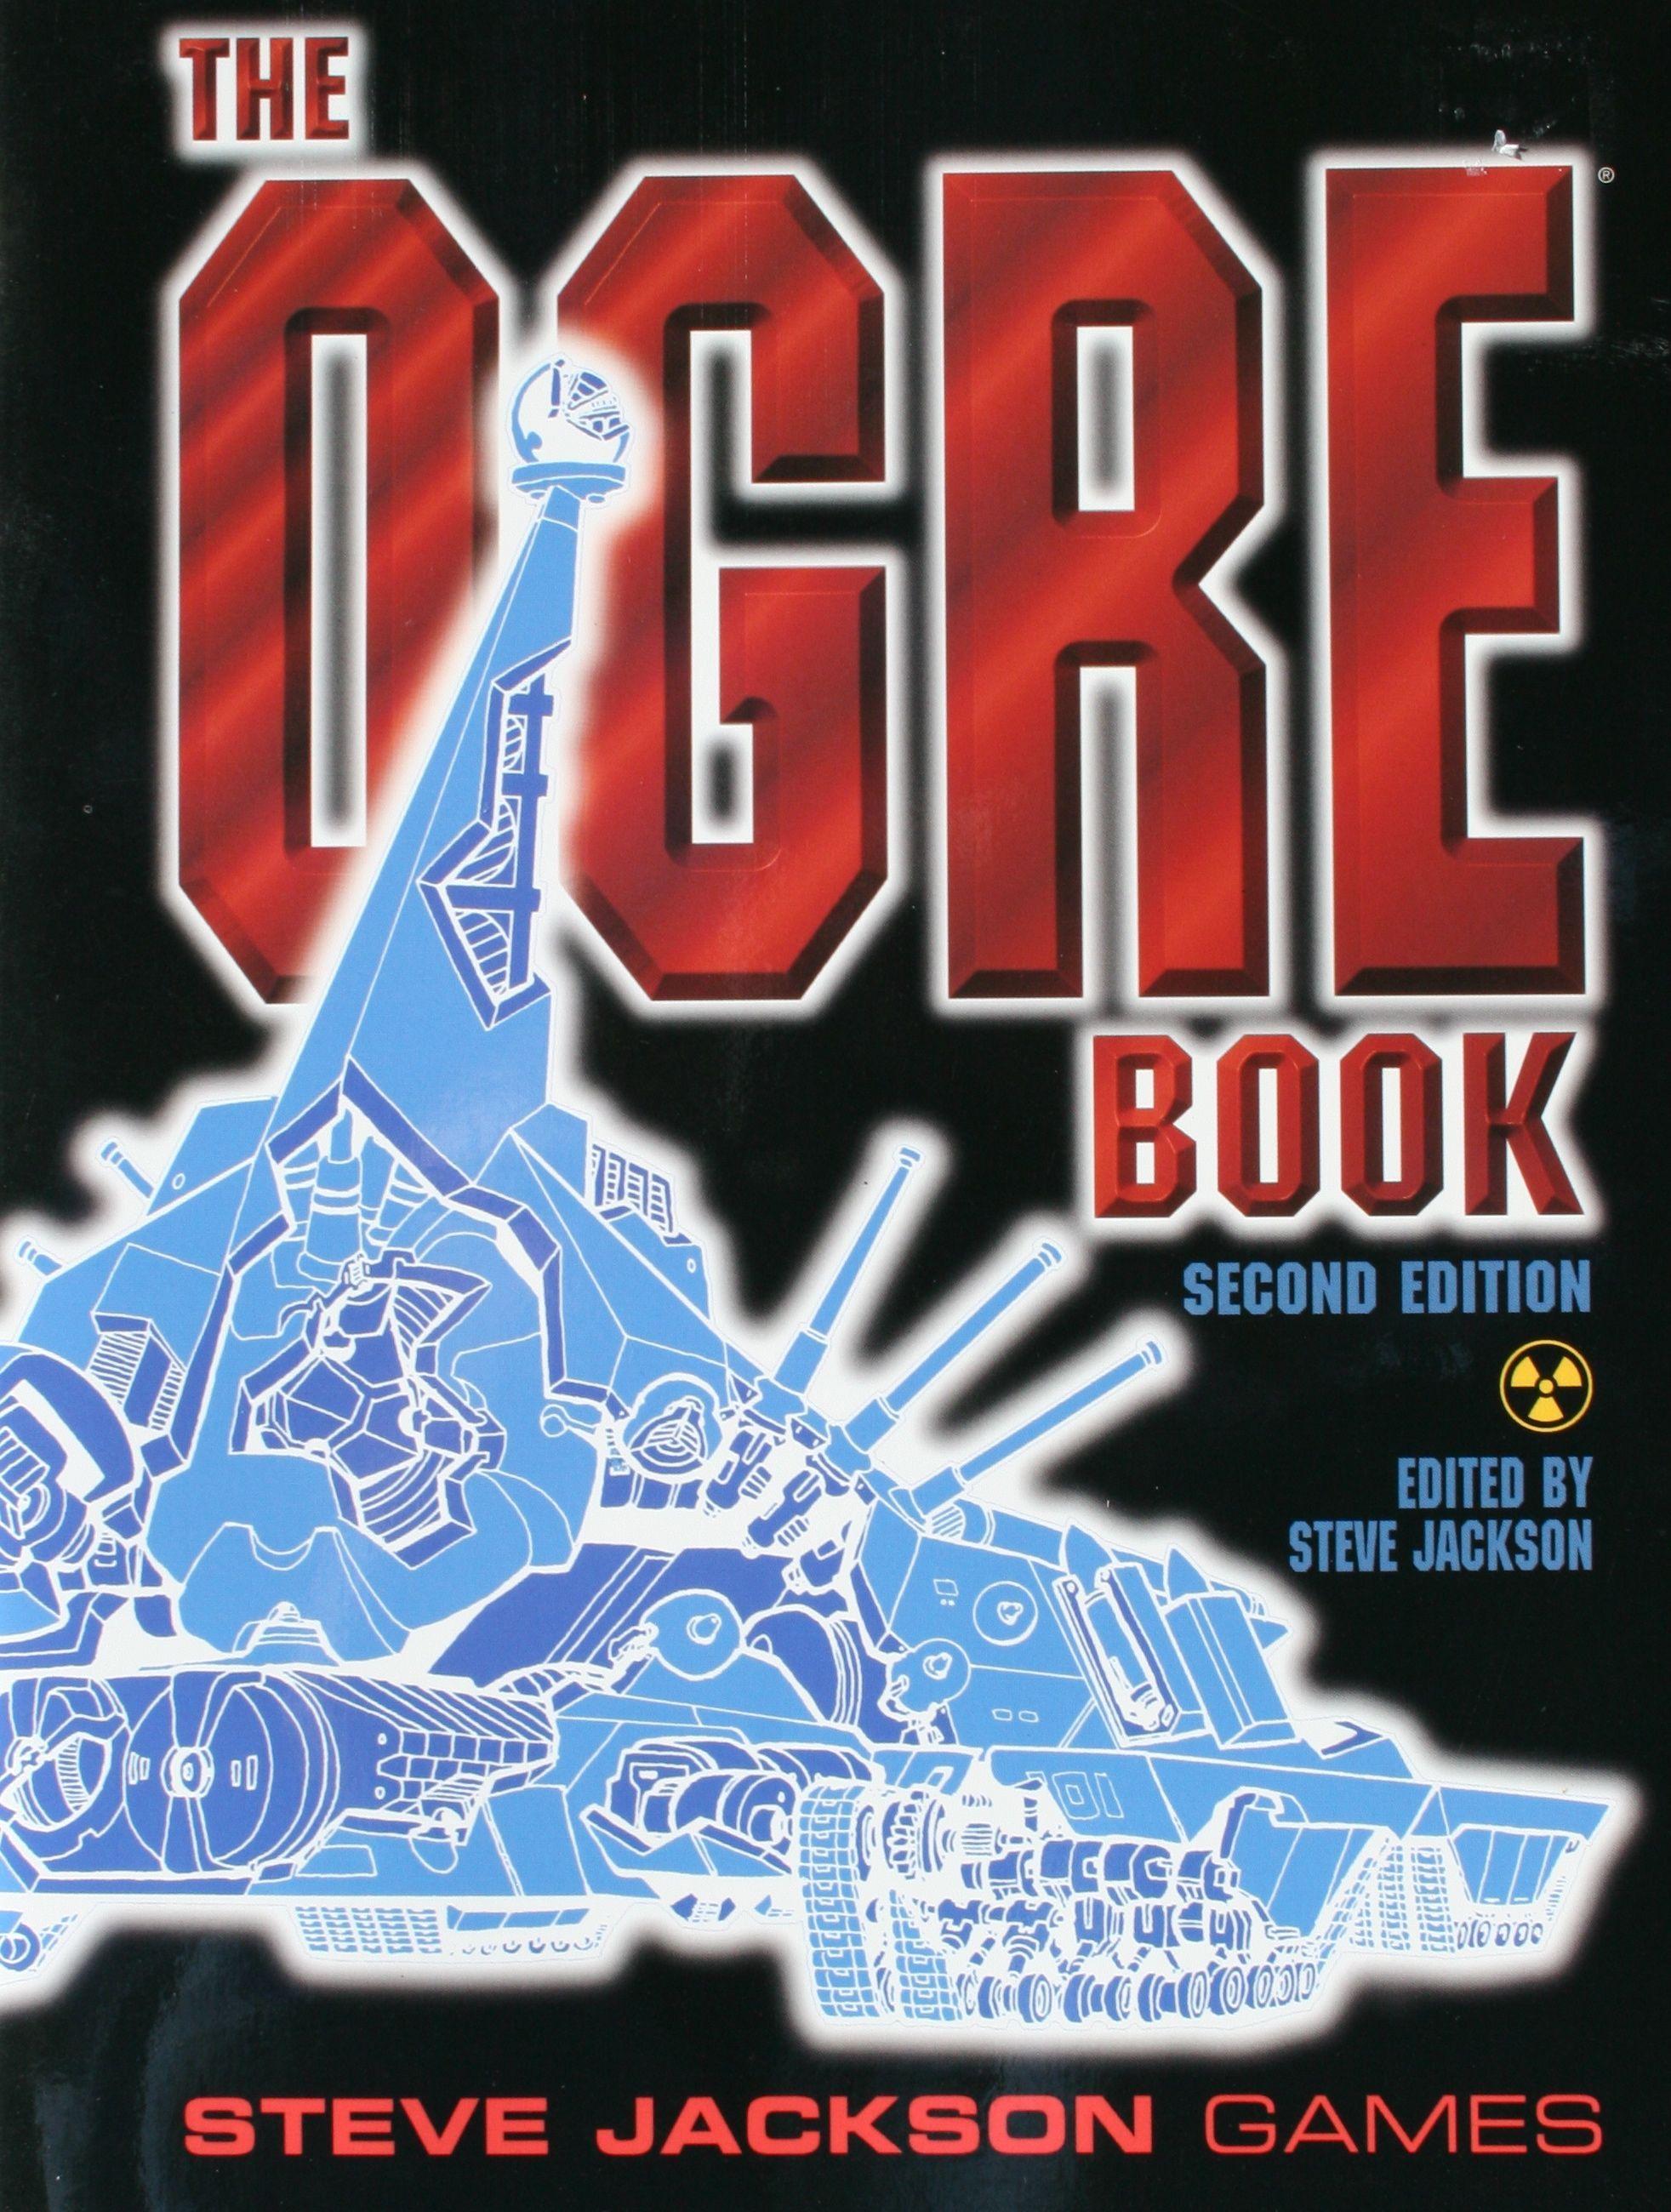 The Ogre Book